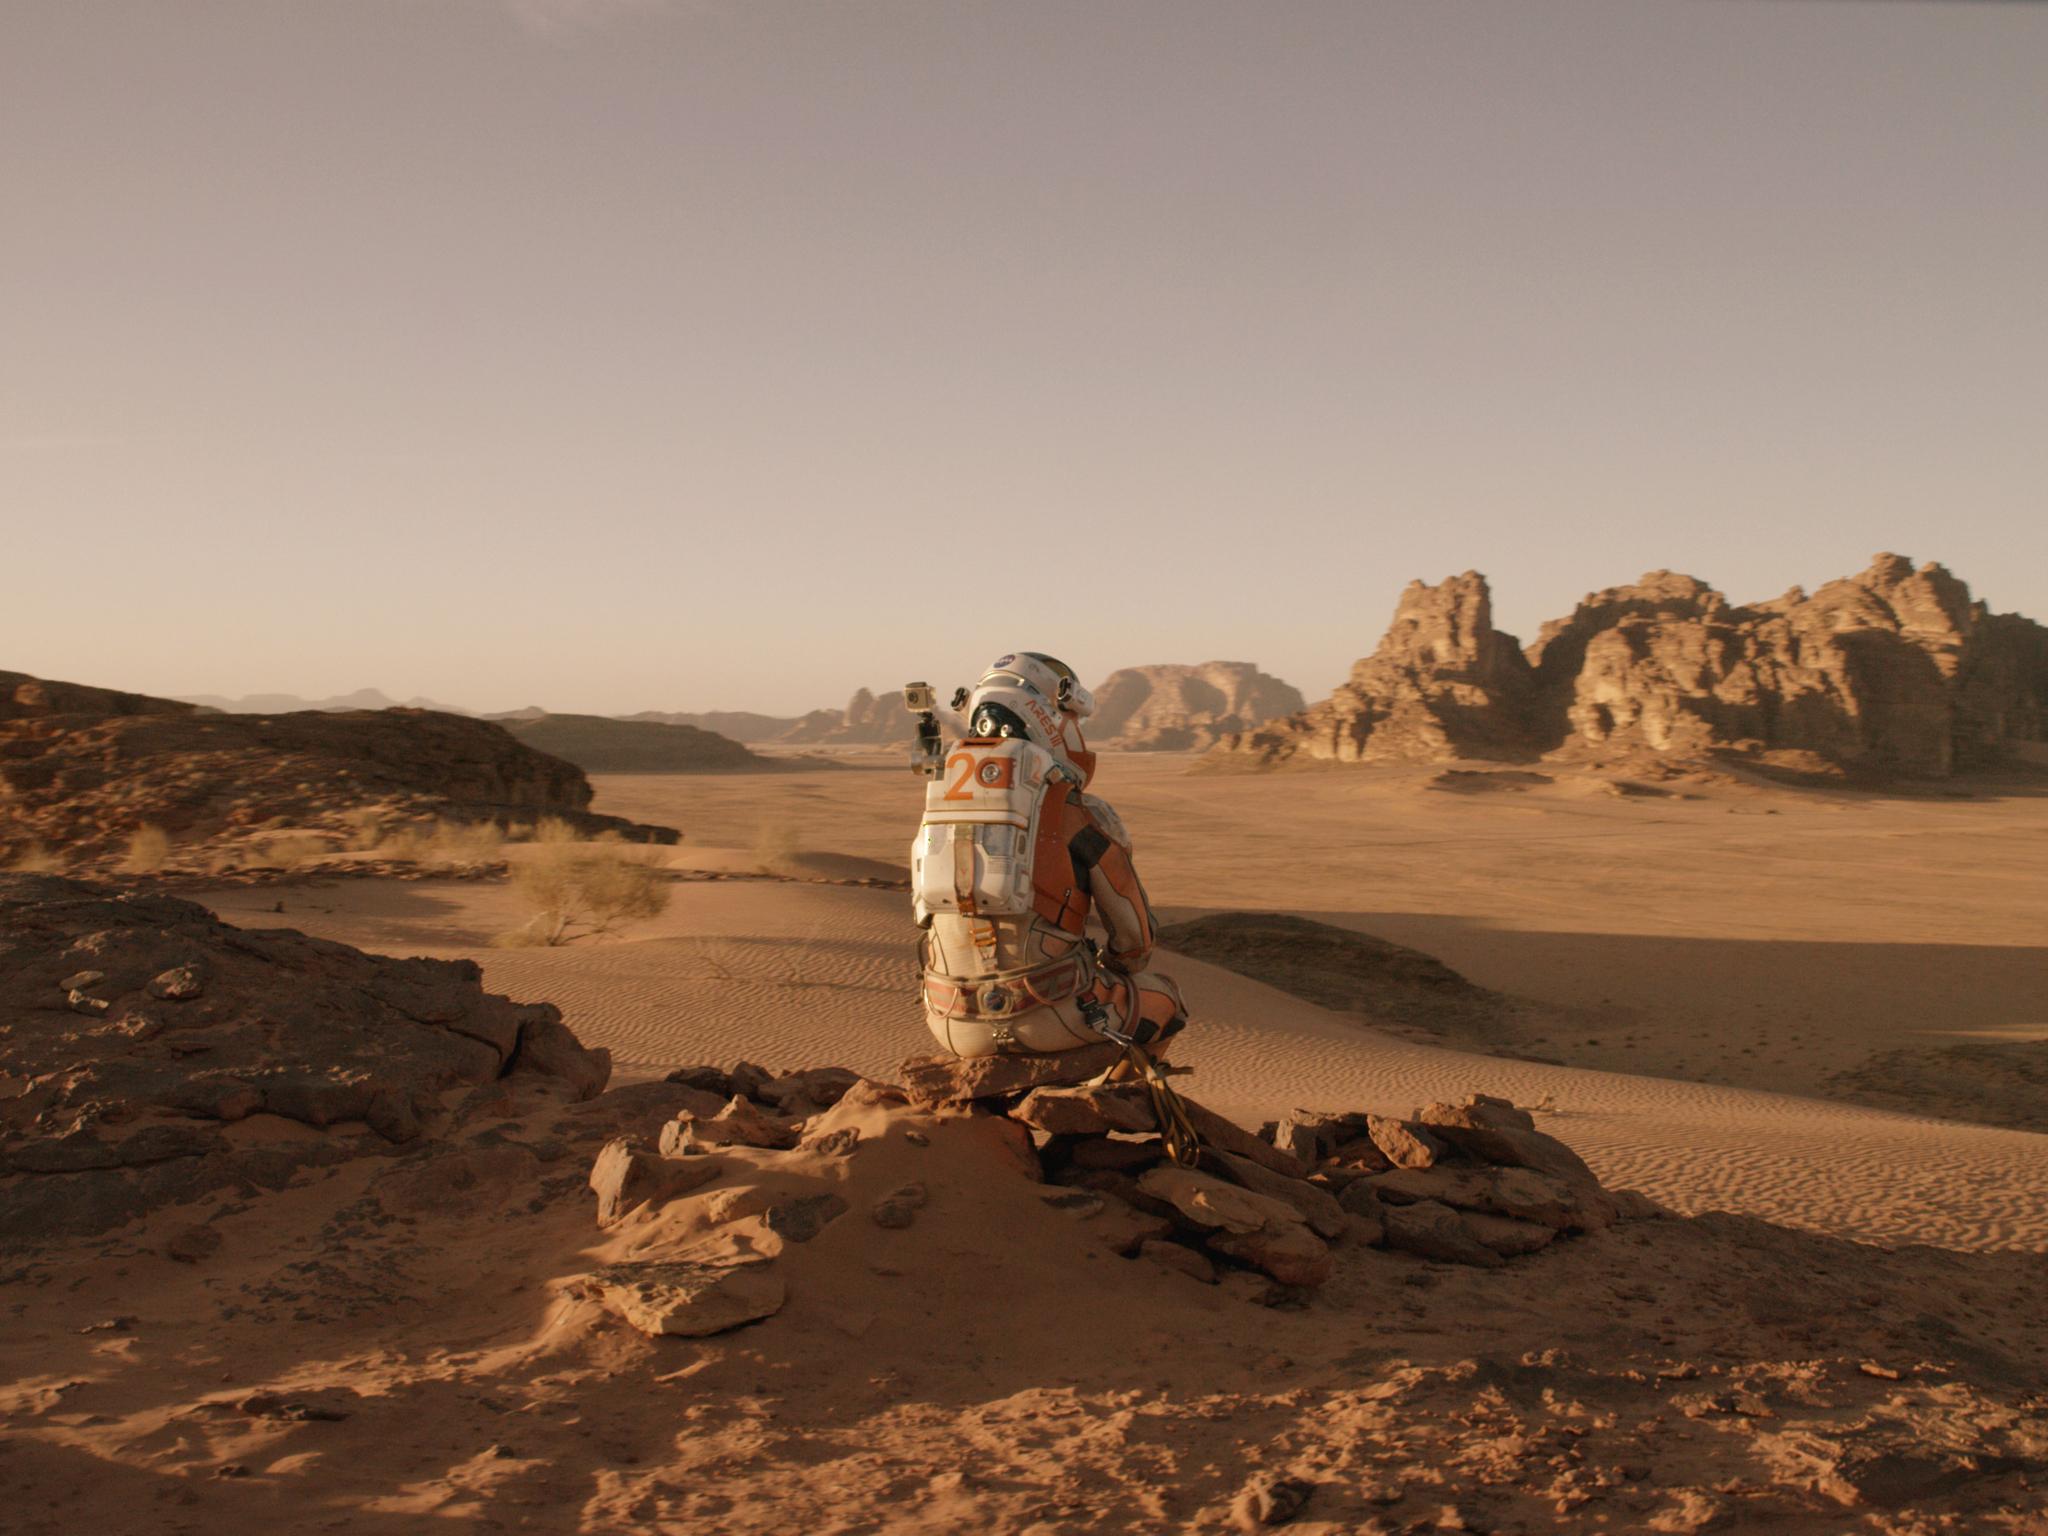 The Martian starring Matt Damon